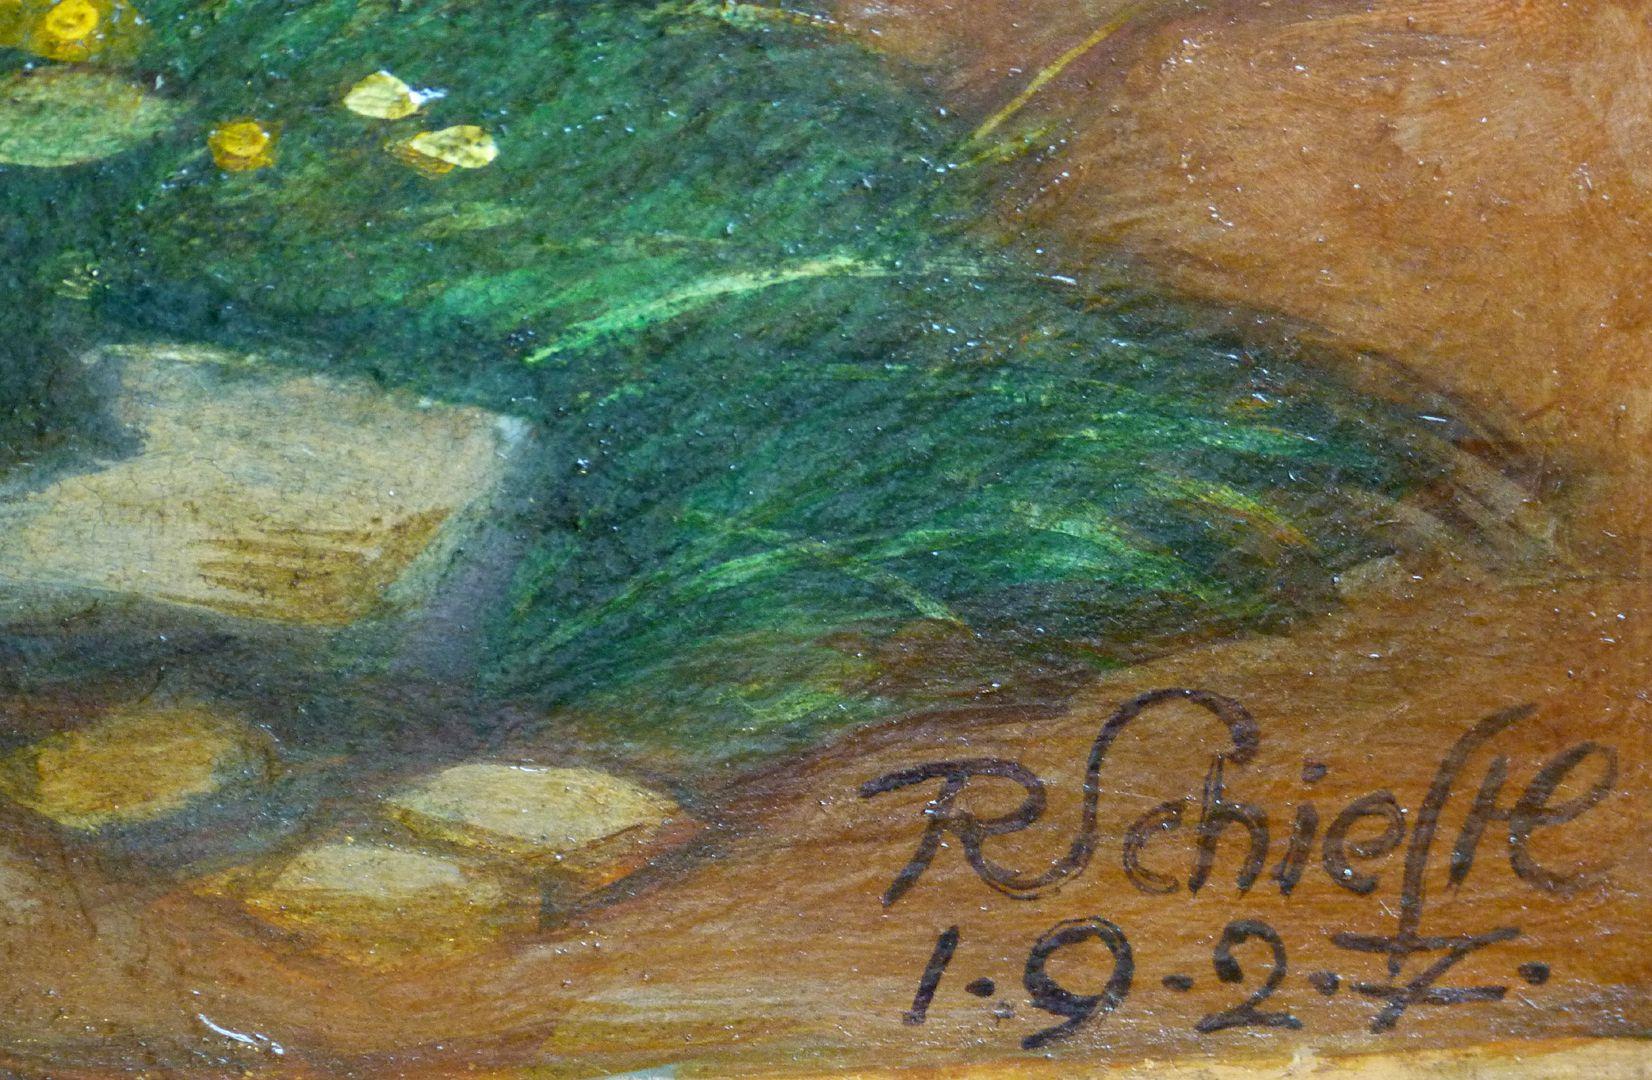 Woman at a stone cross Signature